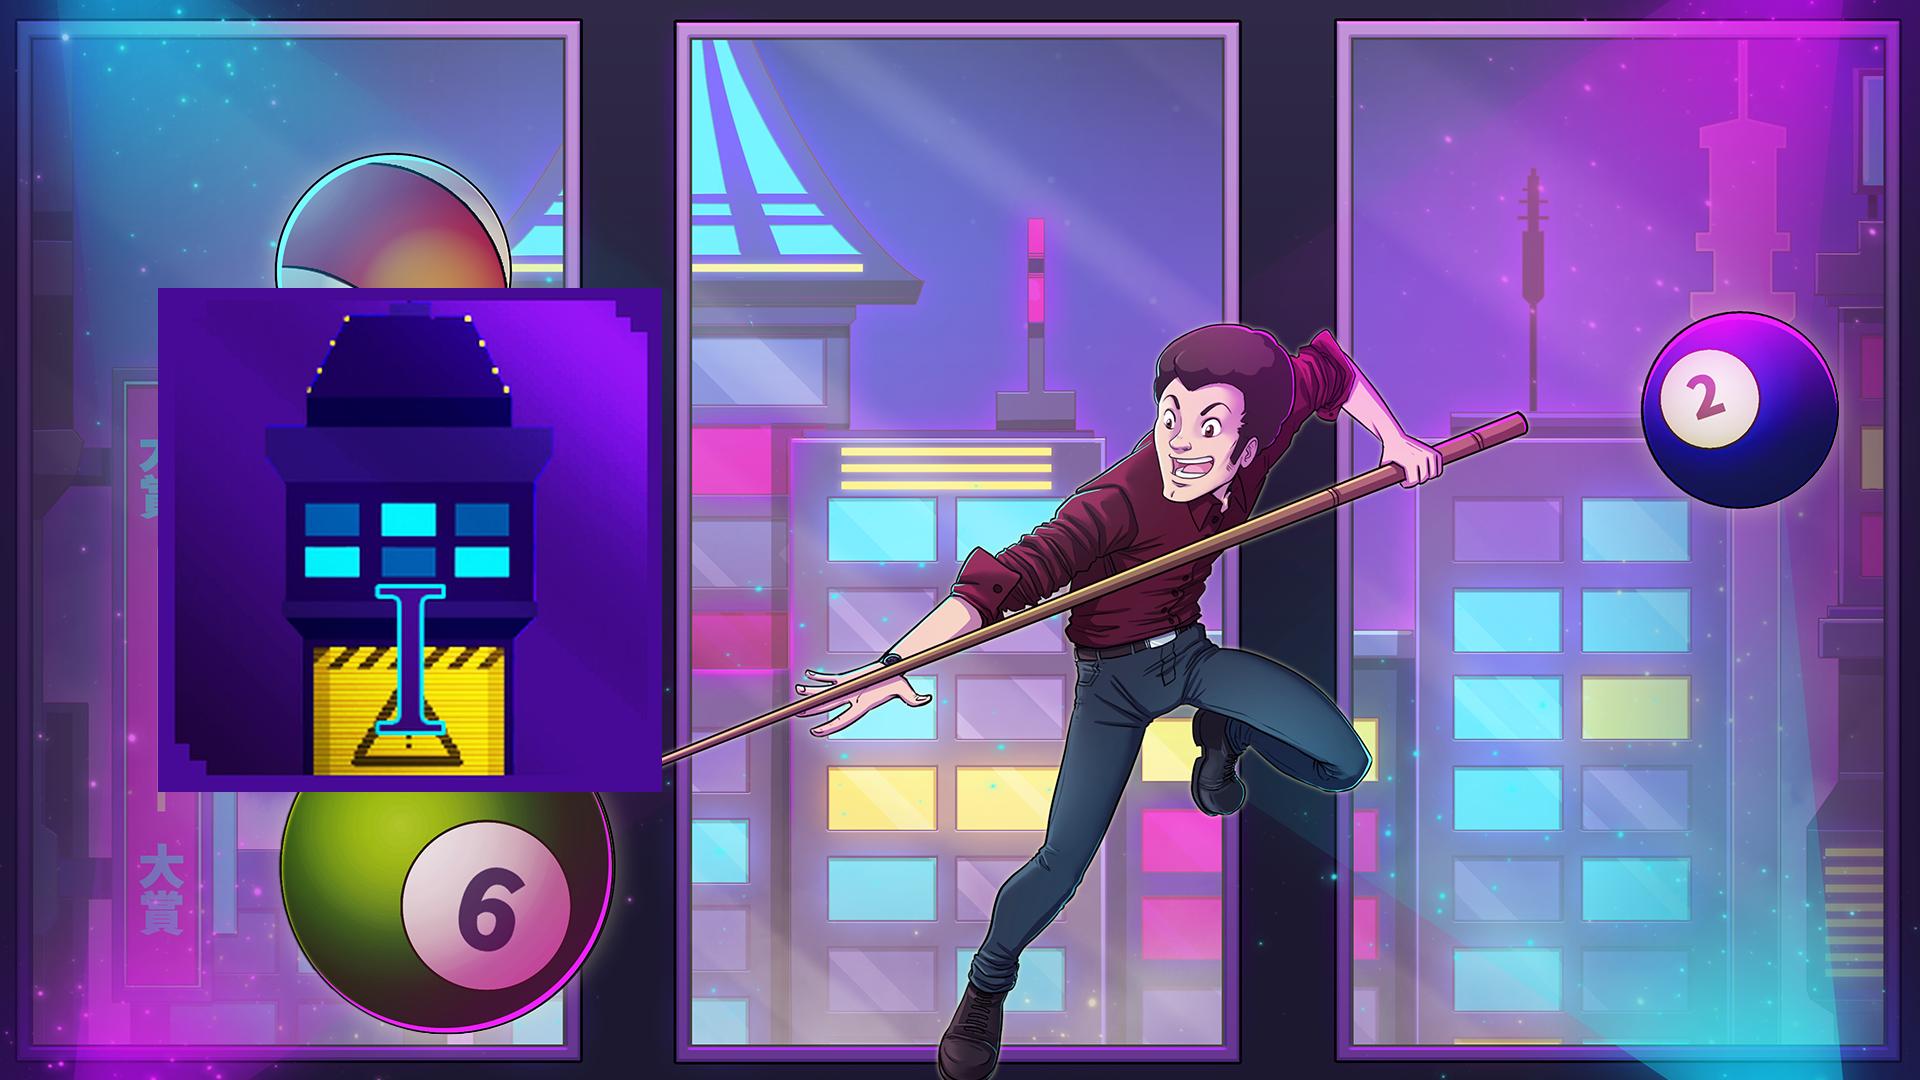 Icon for Switch Hero I